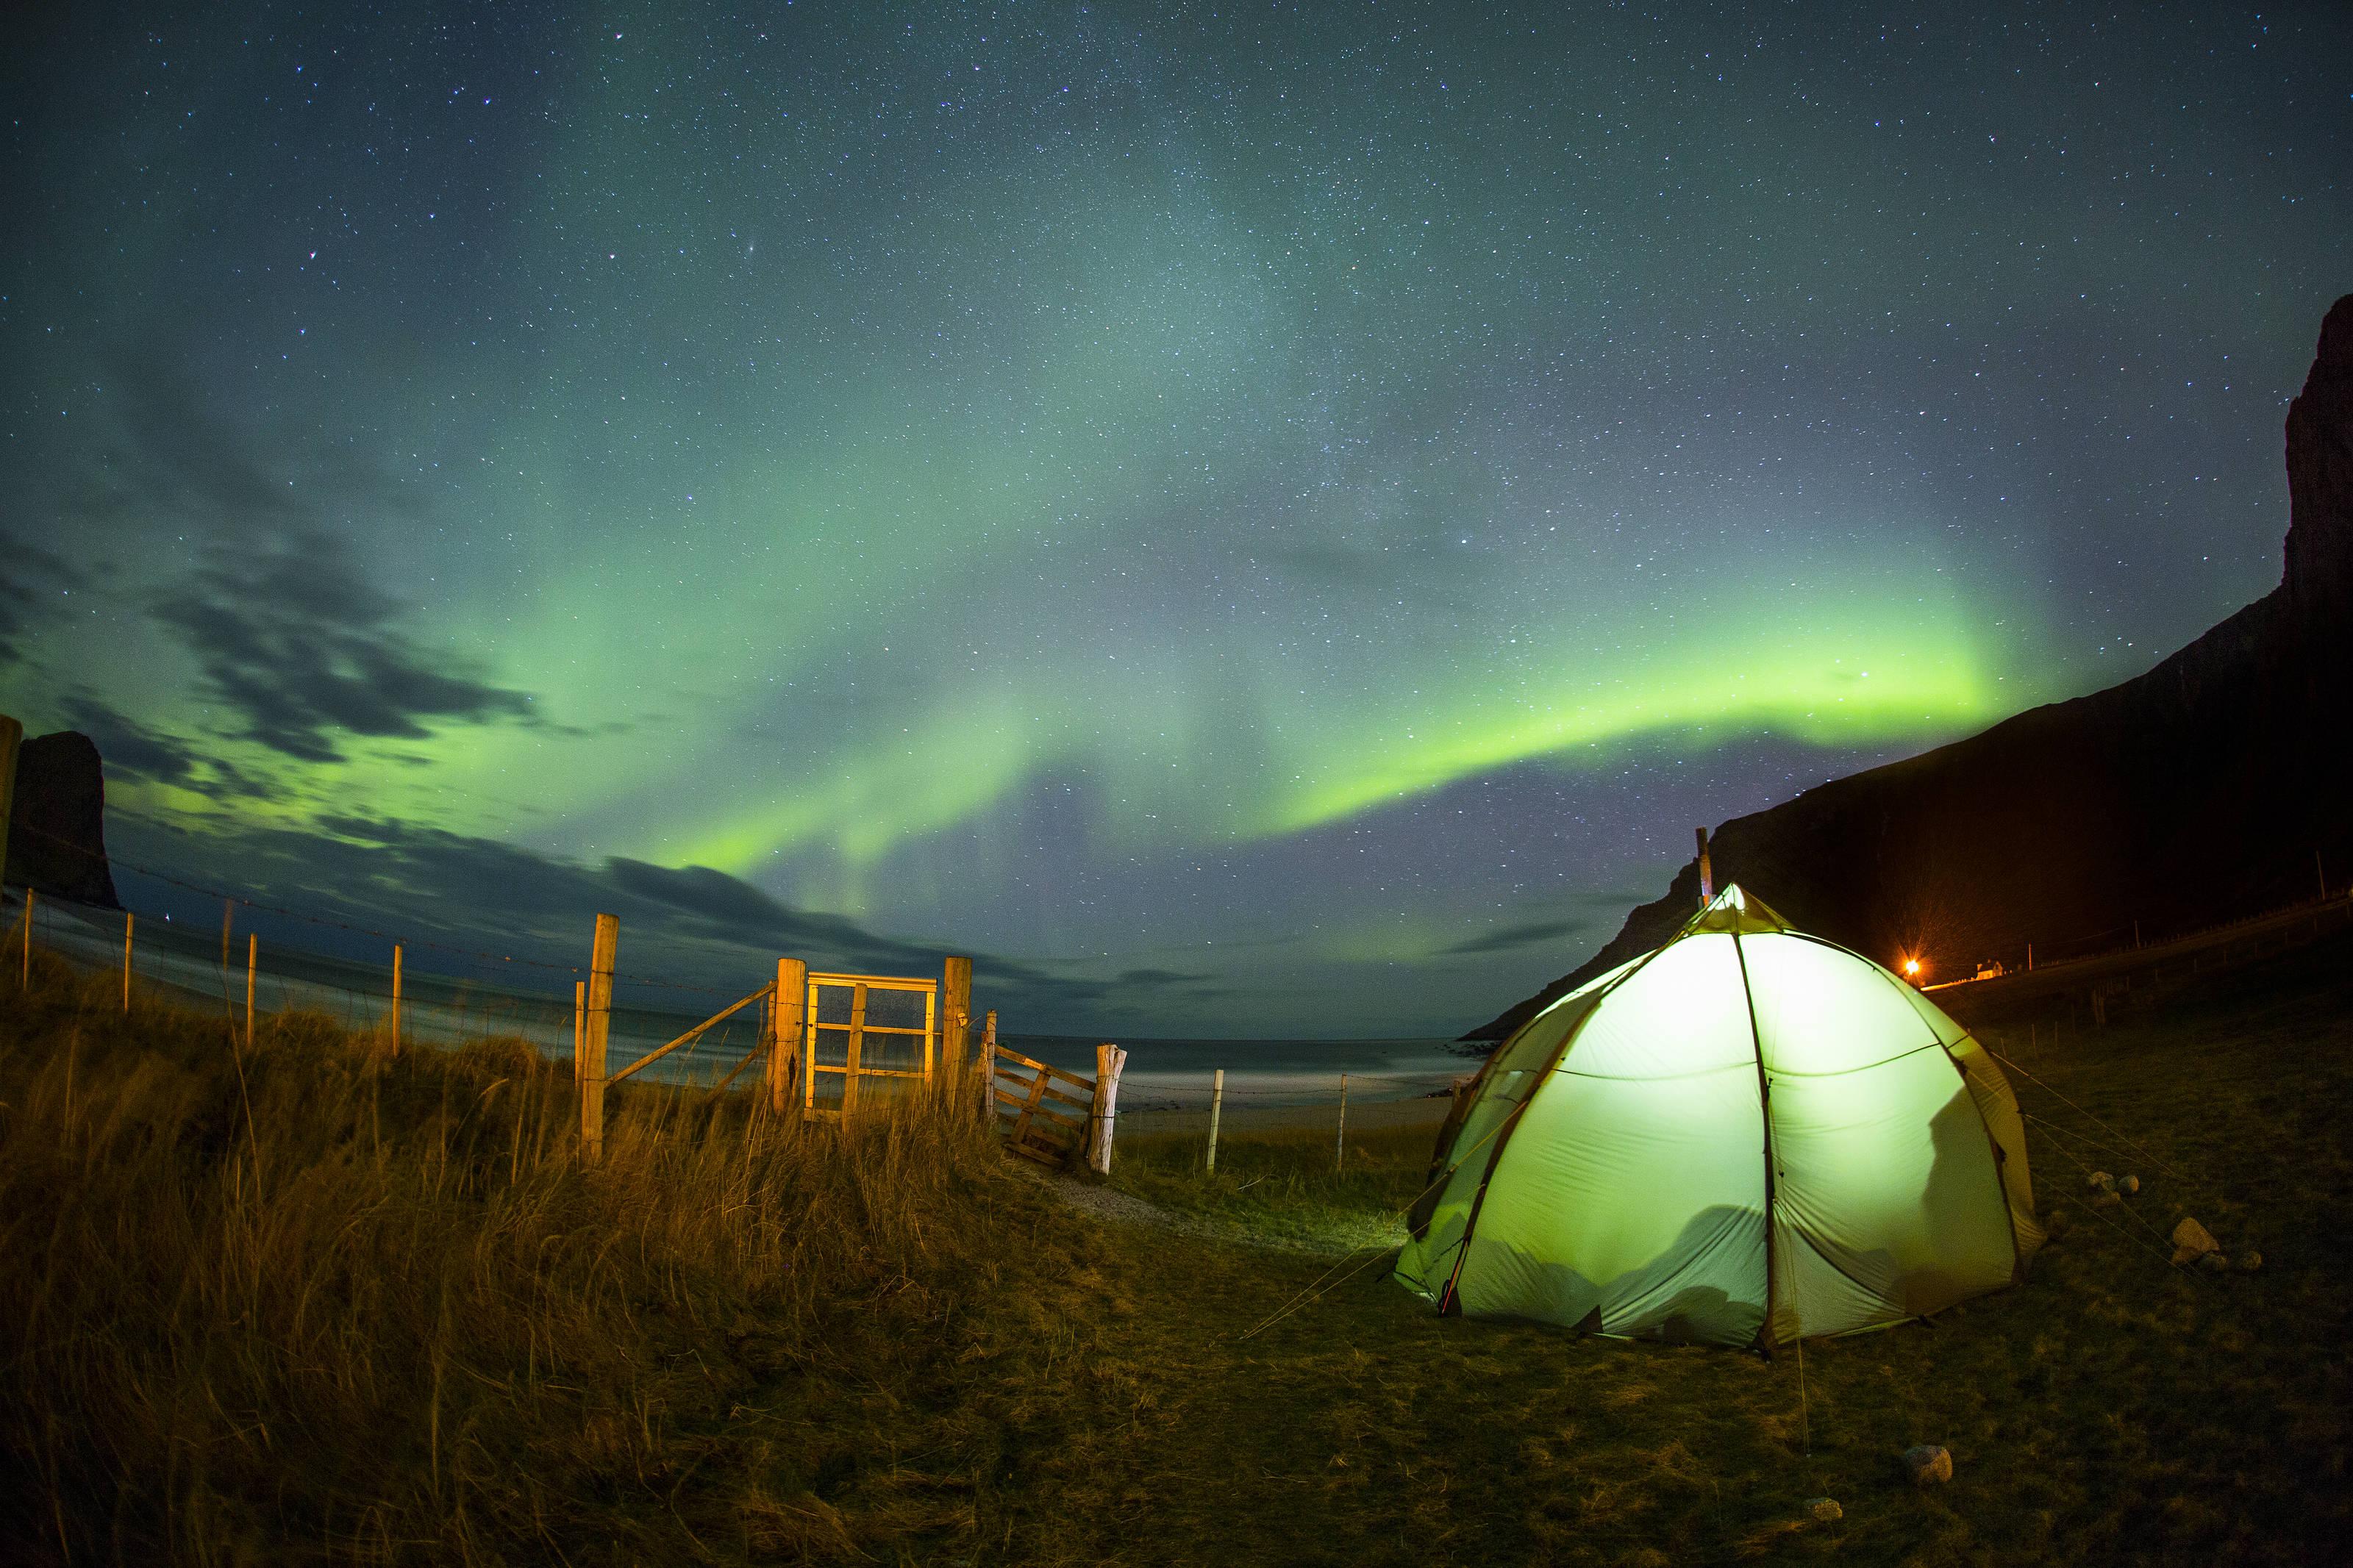 Mick Fanning beim Camping in Norwegen. Credit: Red Bull Content Pool